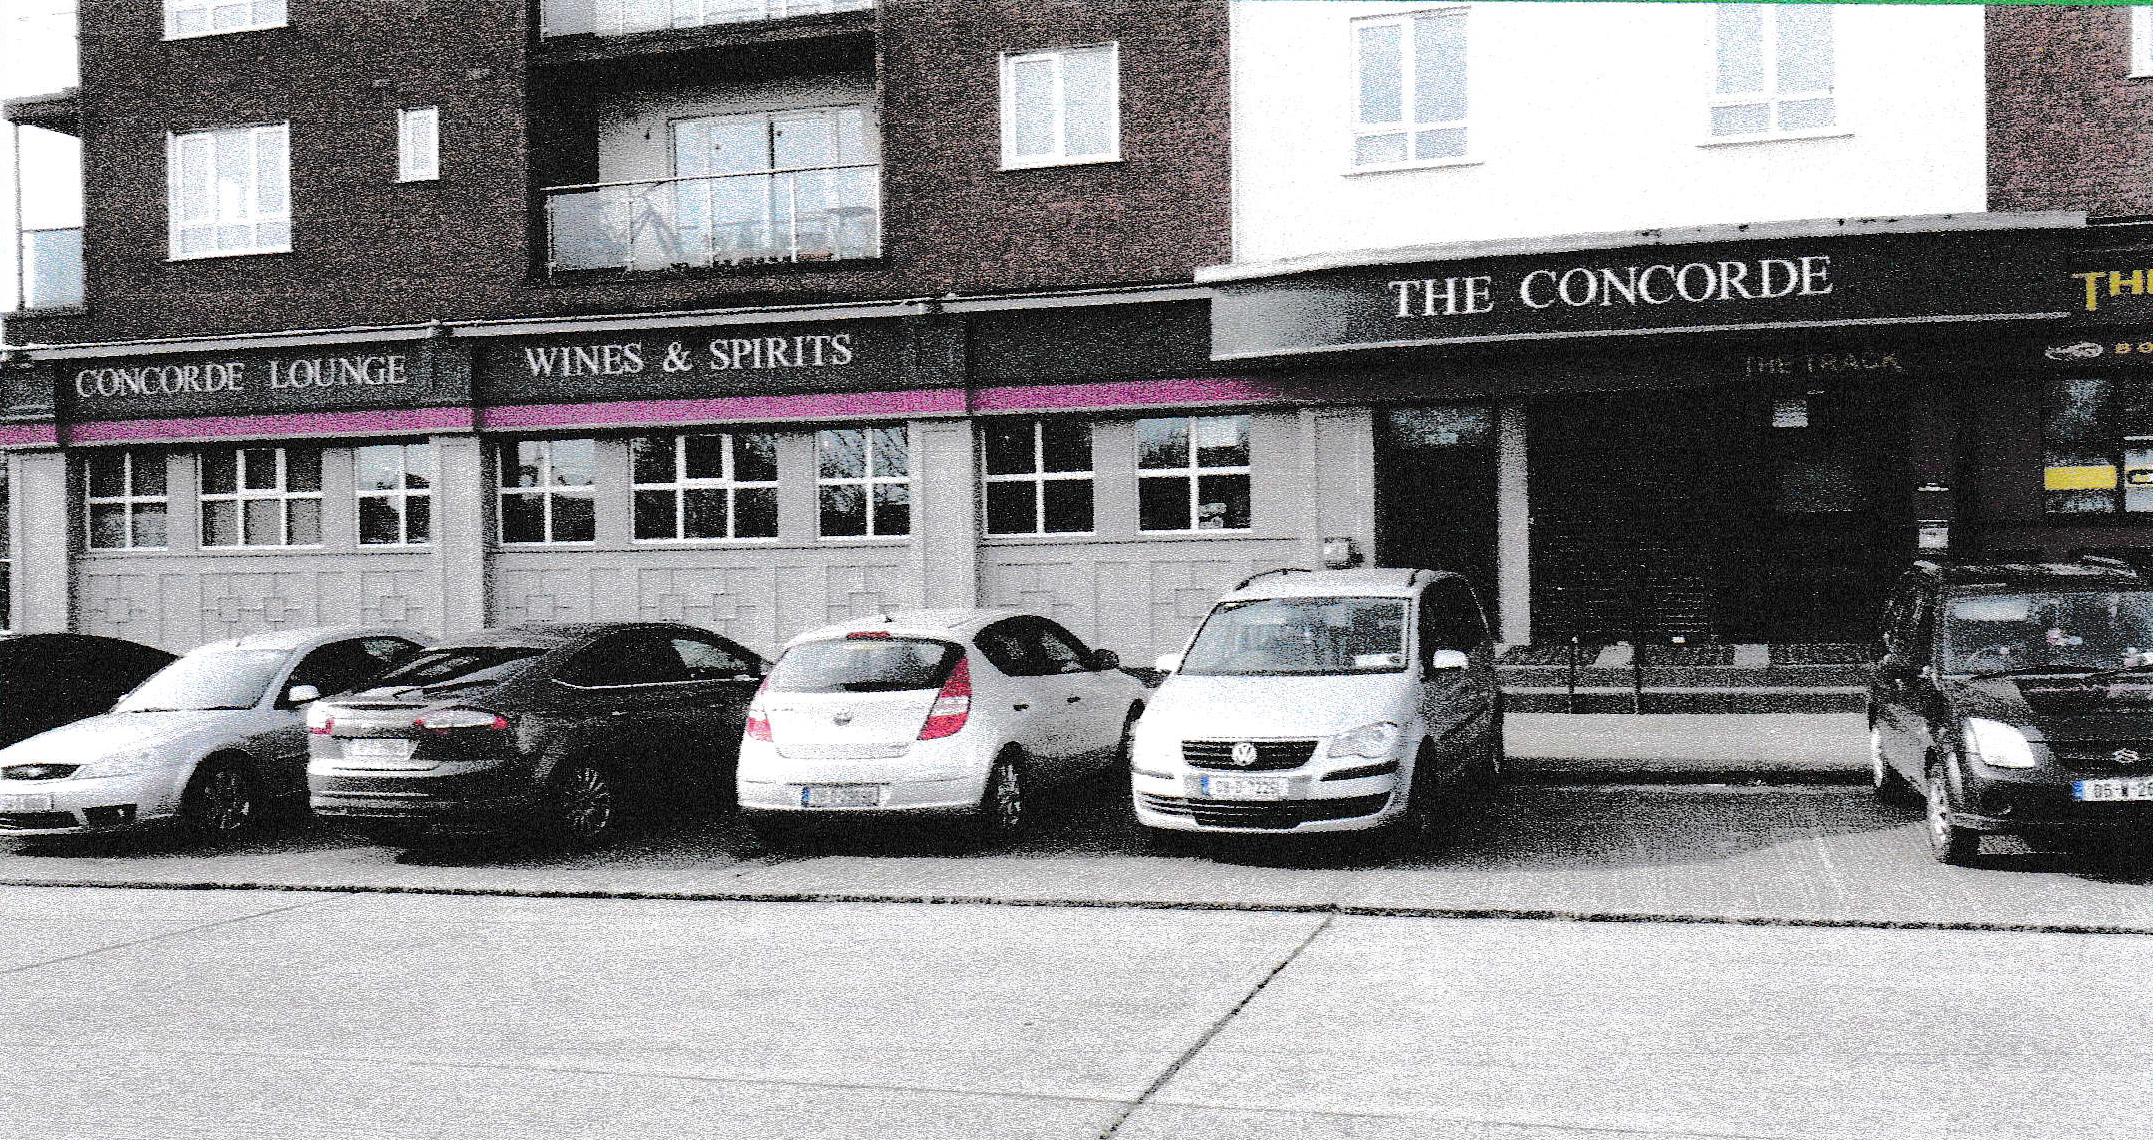 THE CONCORDE Dublin Property